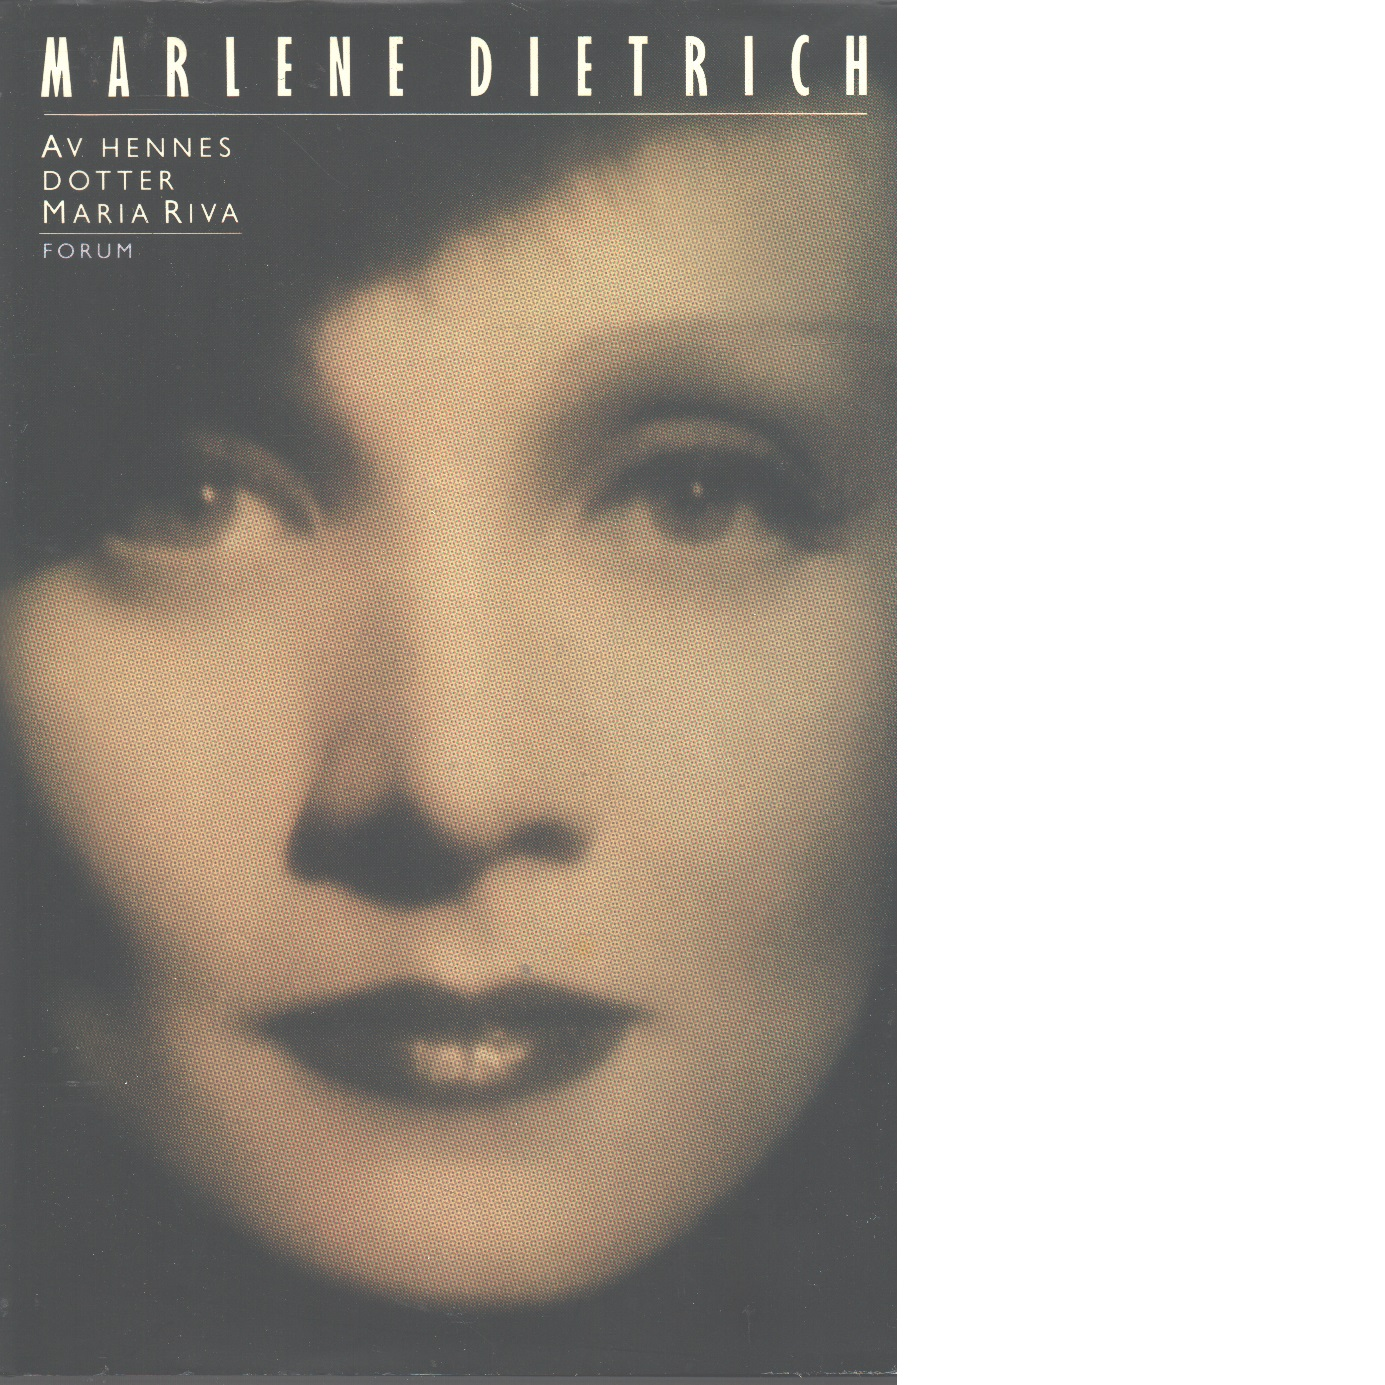 Marlene Dietrich / av hennes dotter, Maria Riva - Riva, Maria